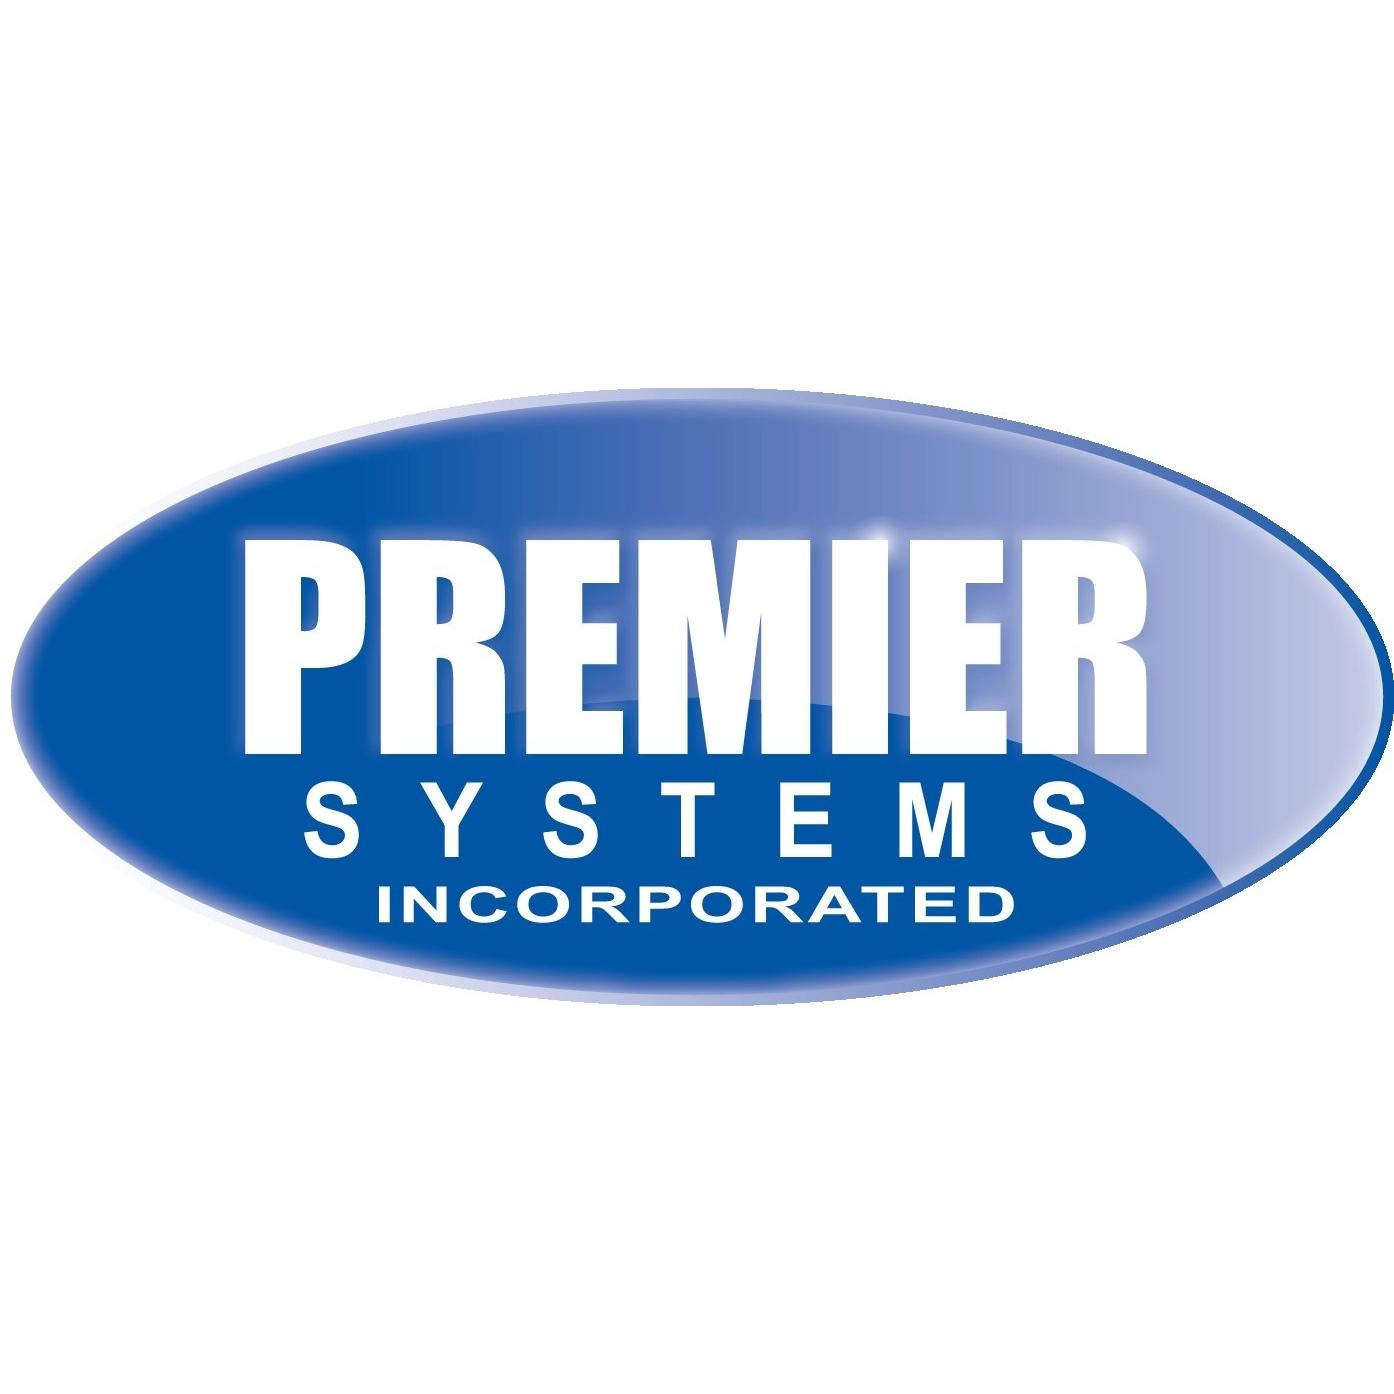 Premier Systems, Inc